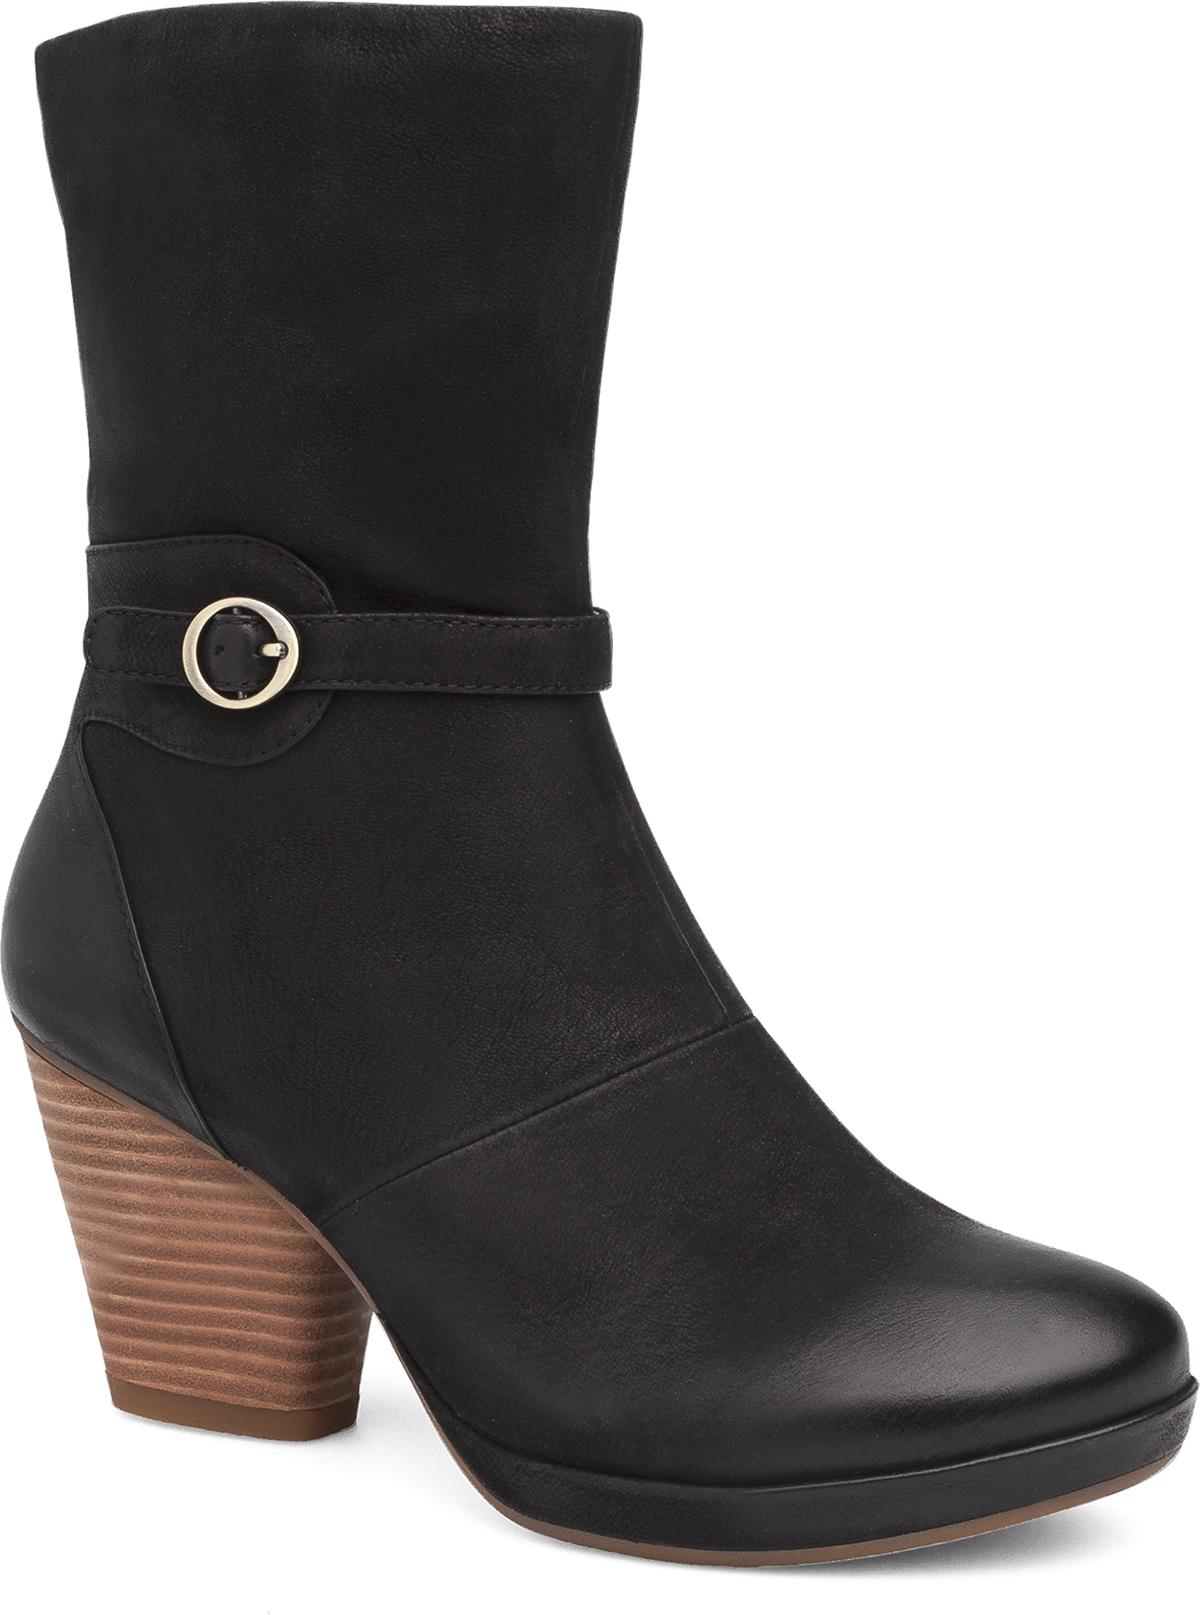 Marietta Black Burnished Nubuck - Dansko® Women's Ankle Boots & Booties Dansko.com